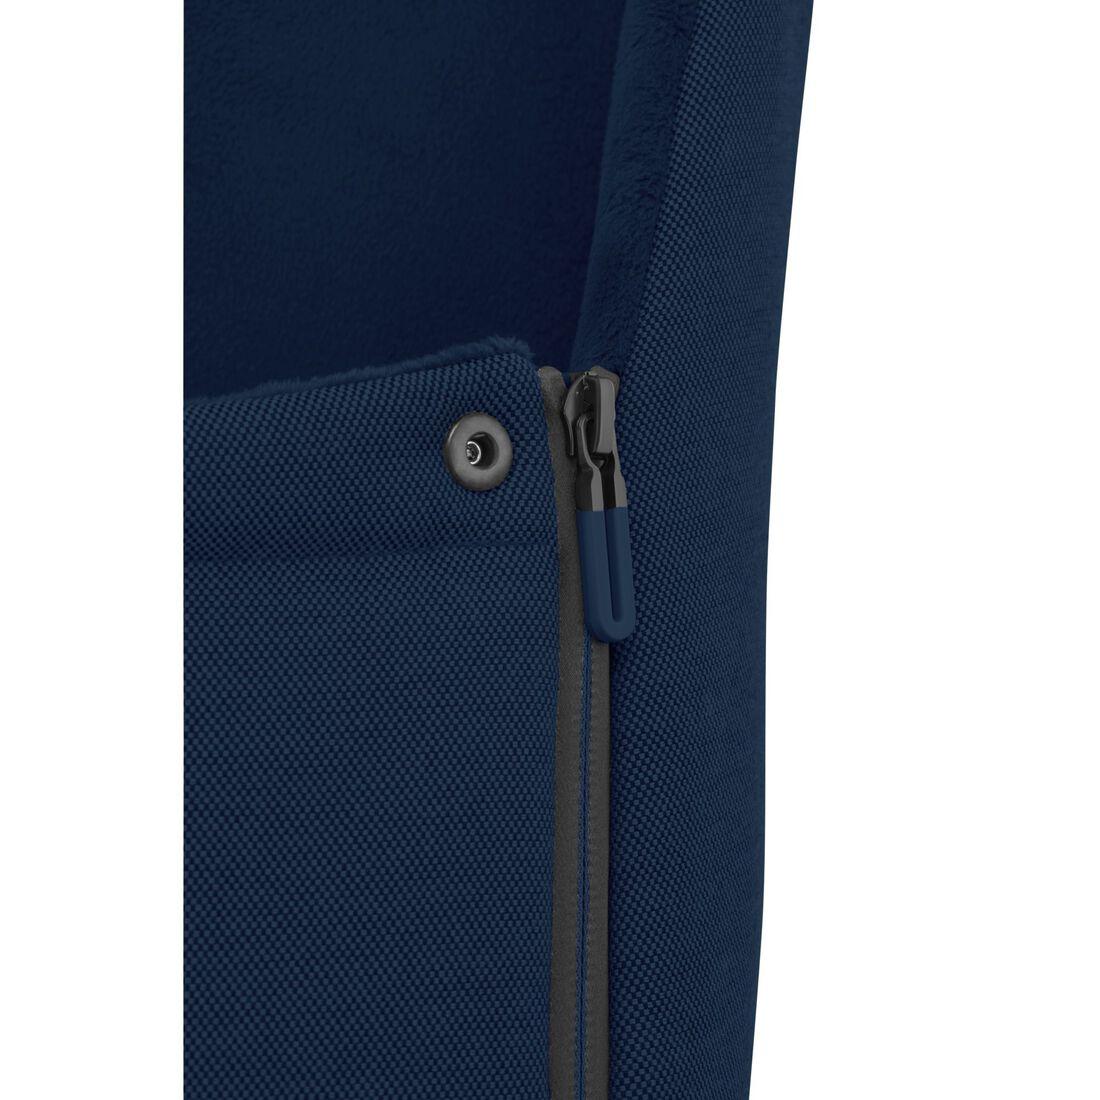 CYBEX Gold Fußsack - Navy Blue in Navy Blue large Bild 2